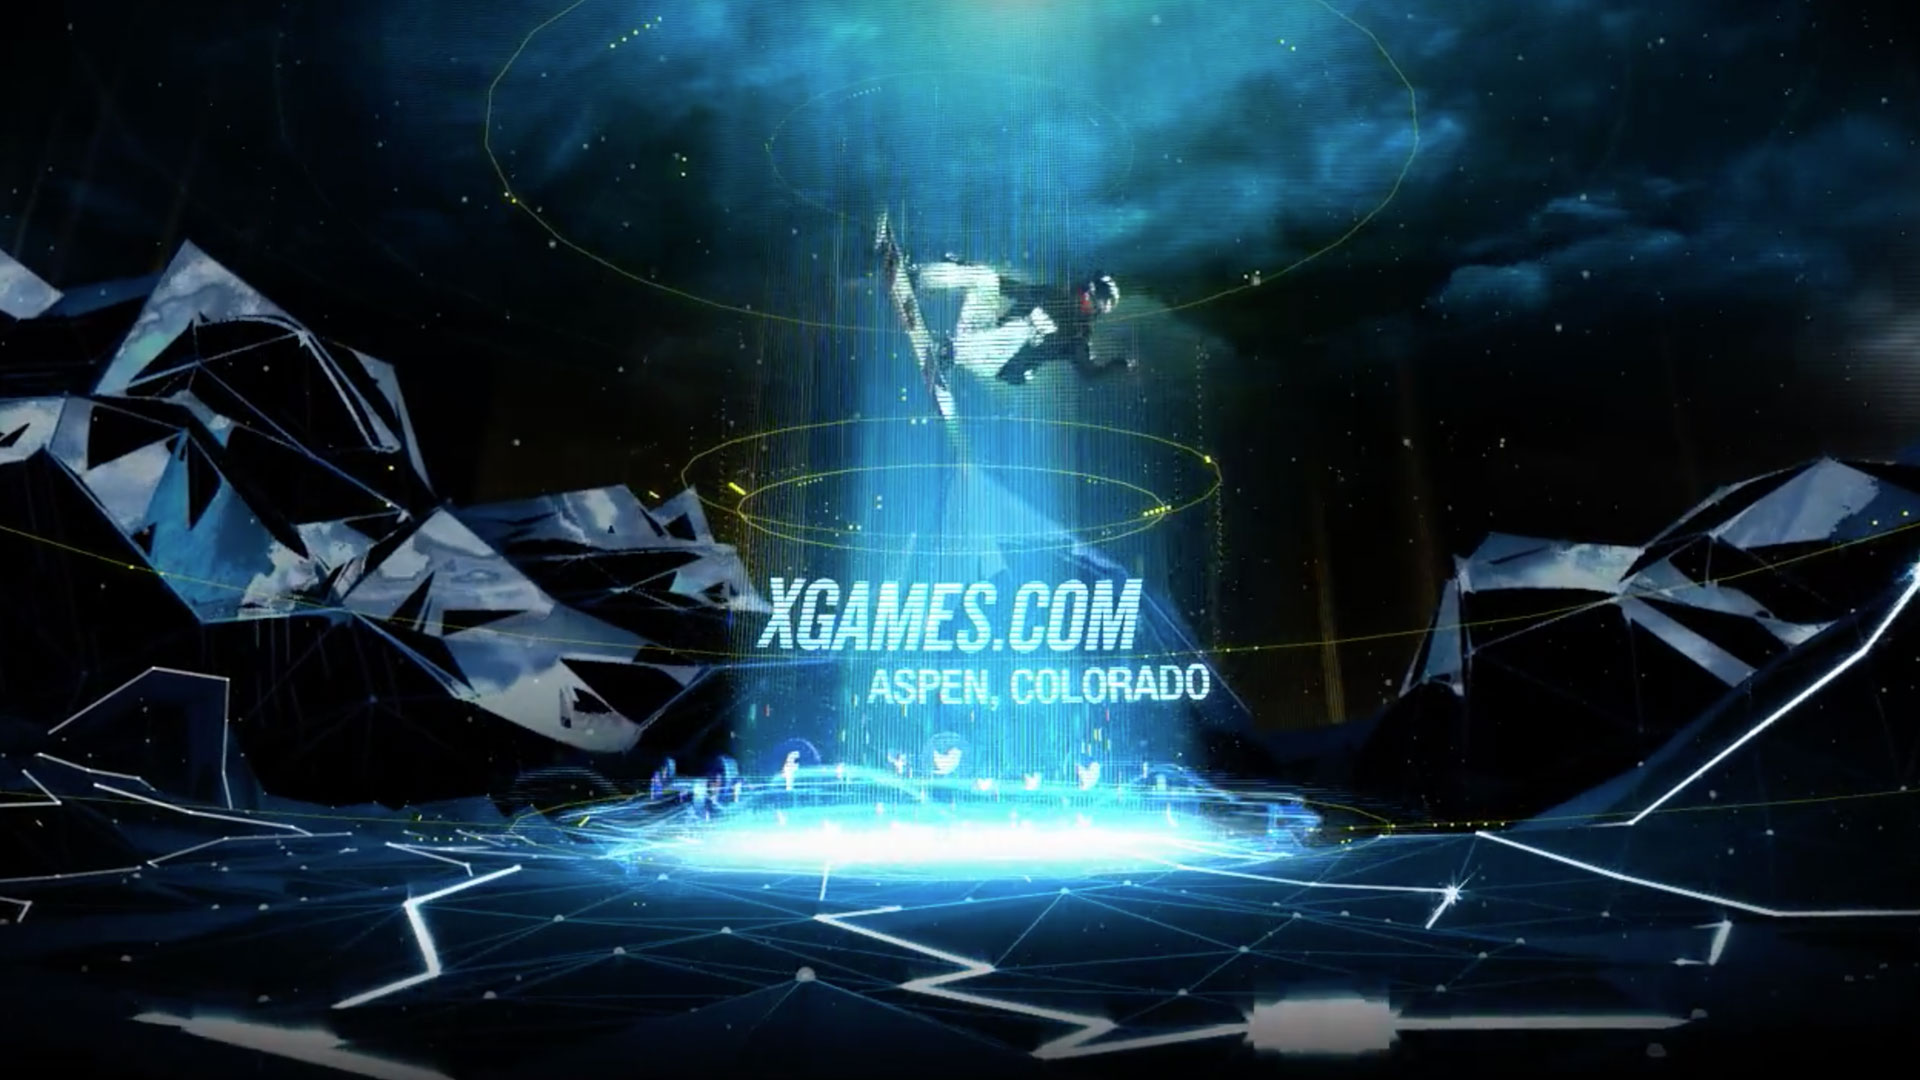 ESPN - Global X Games